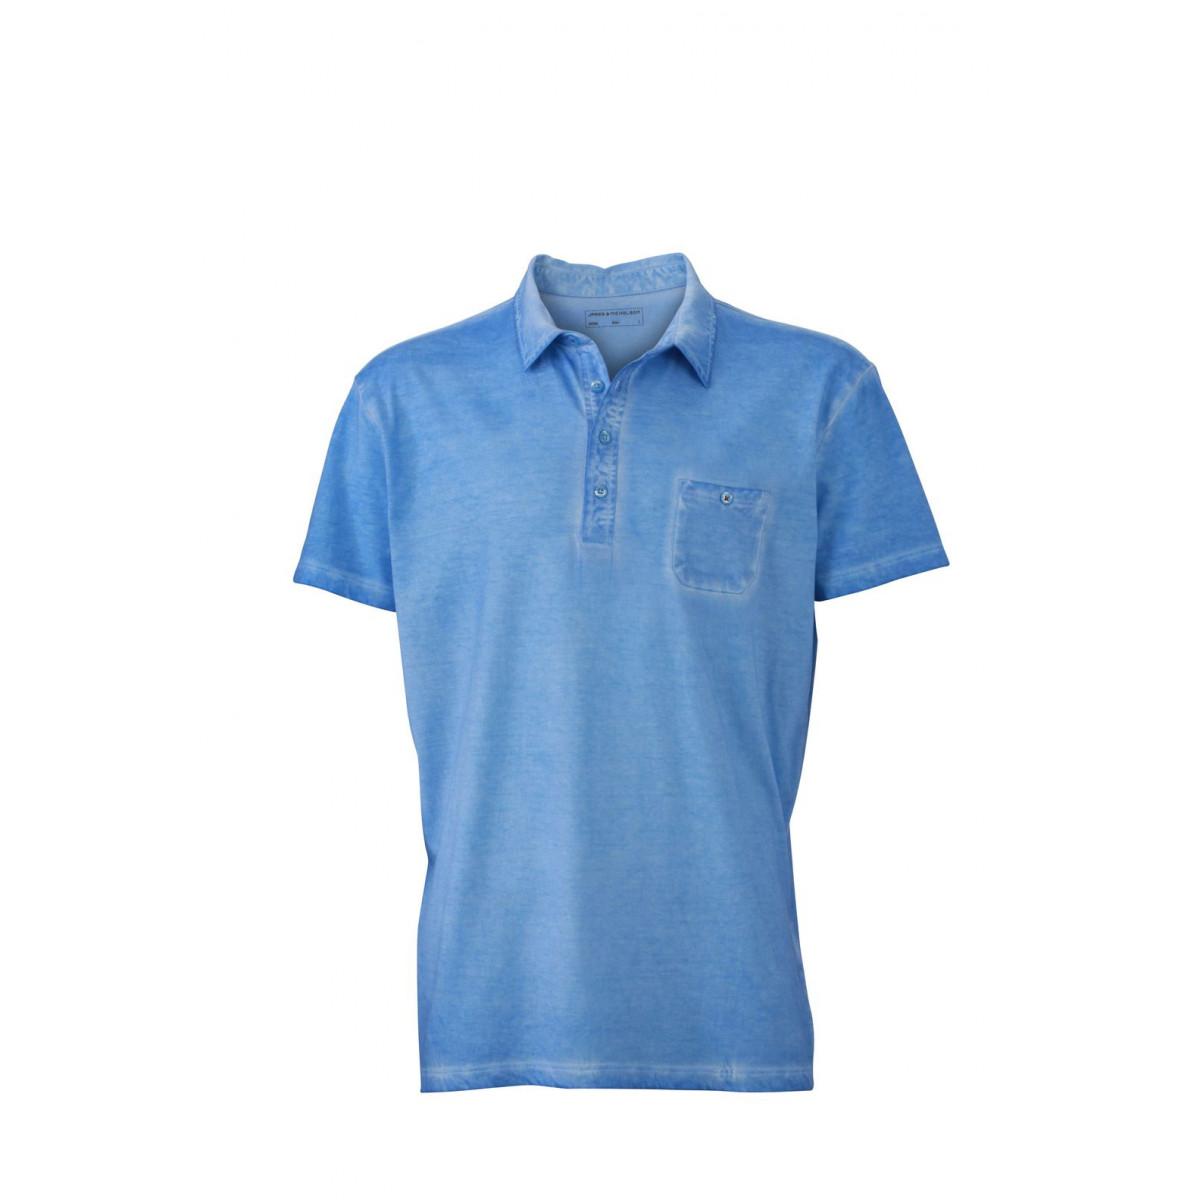 Рубашка поло мужская JN988 Mens Gipsy Polo - Голубой